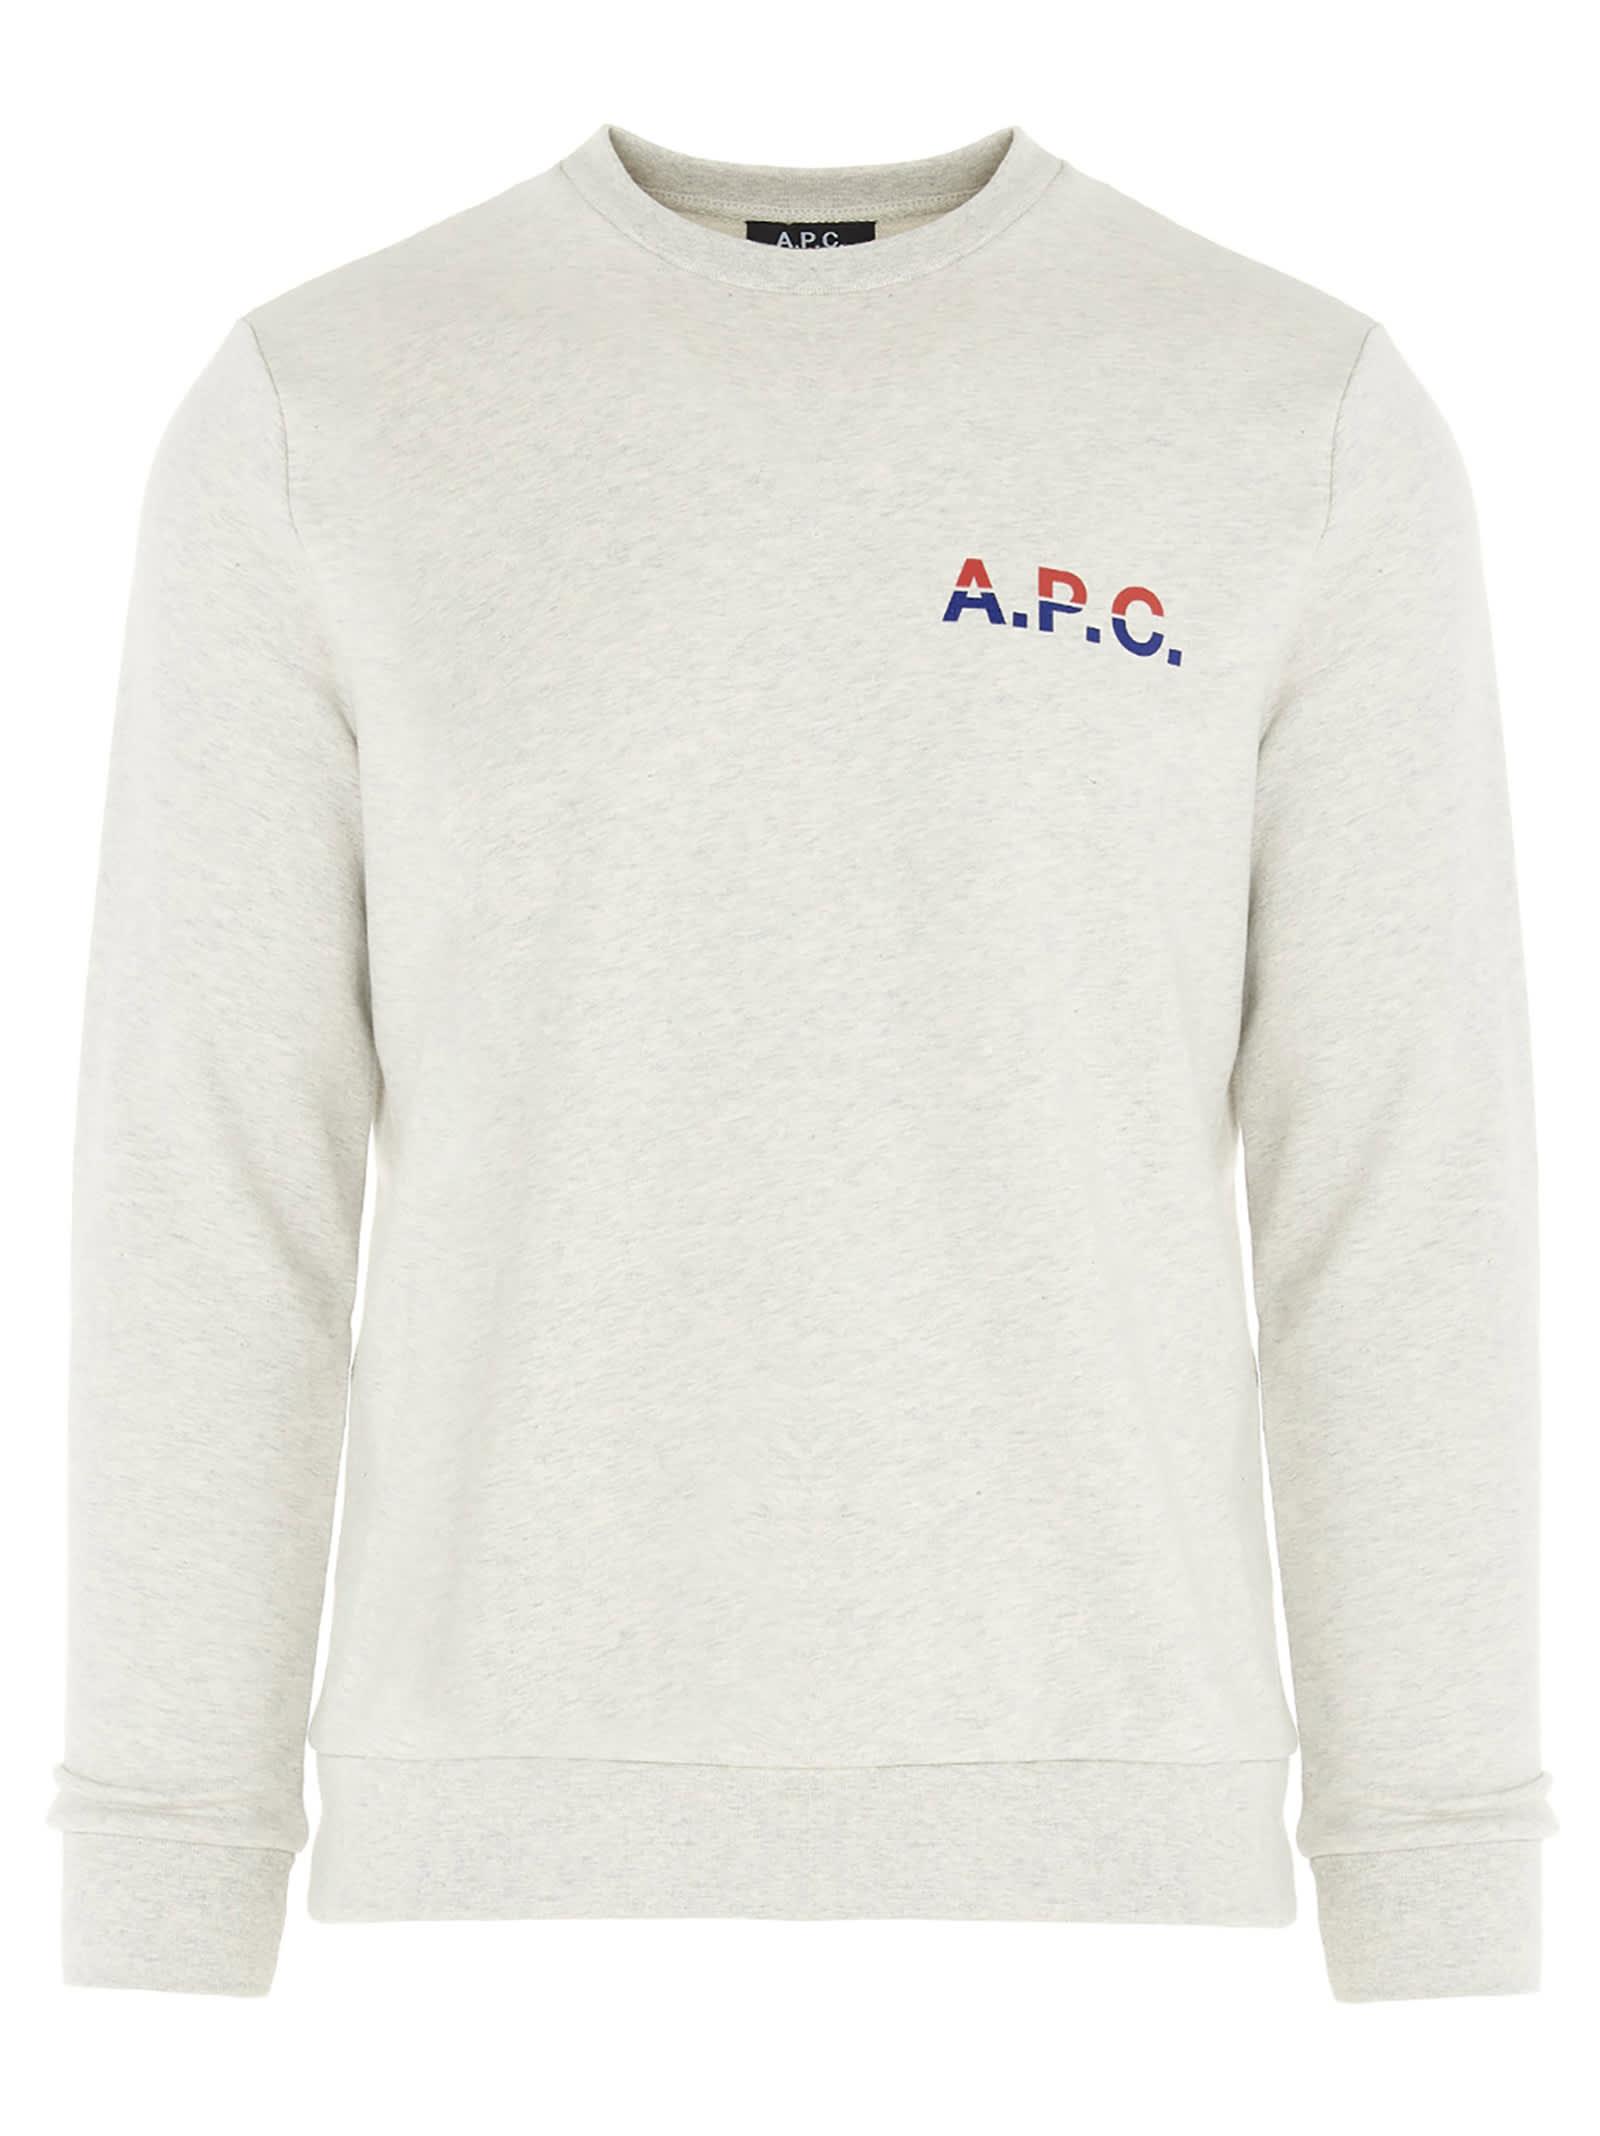 A.P.C. A.P.C. SWEATSHIRT